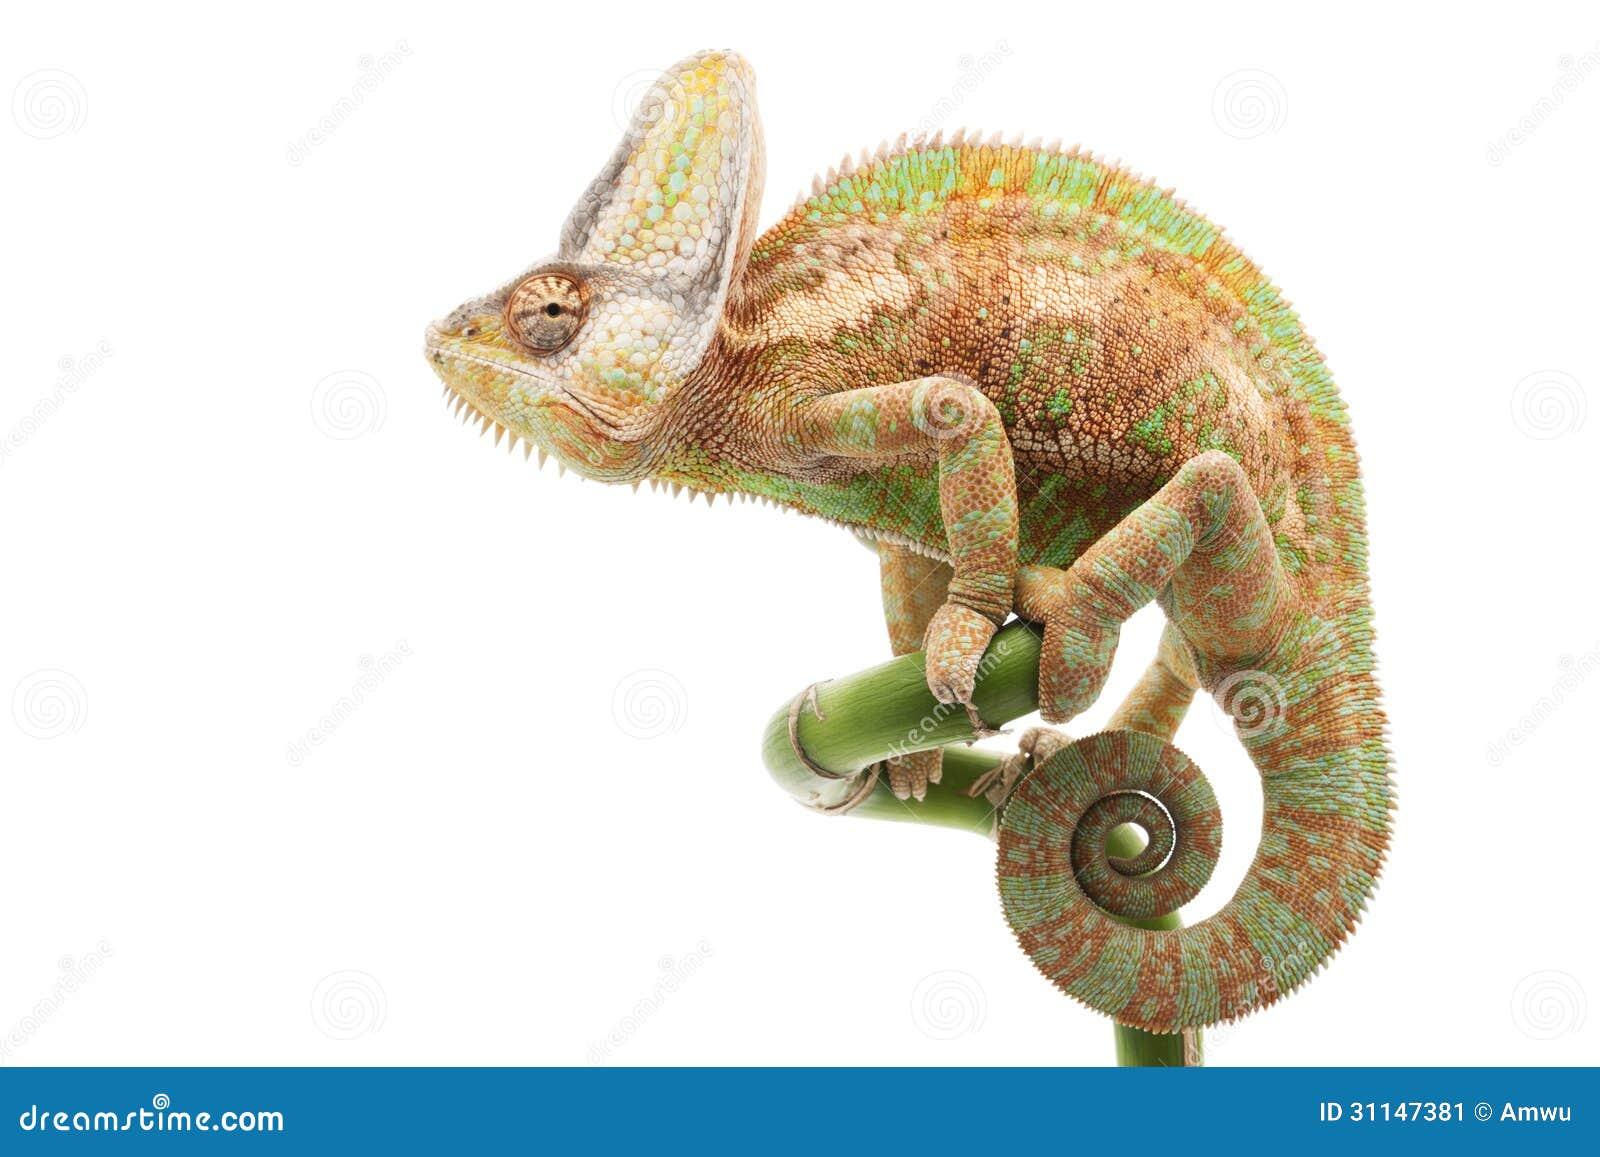 Veiled Chameleon Stock Image Image 31147381